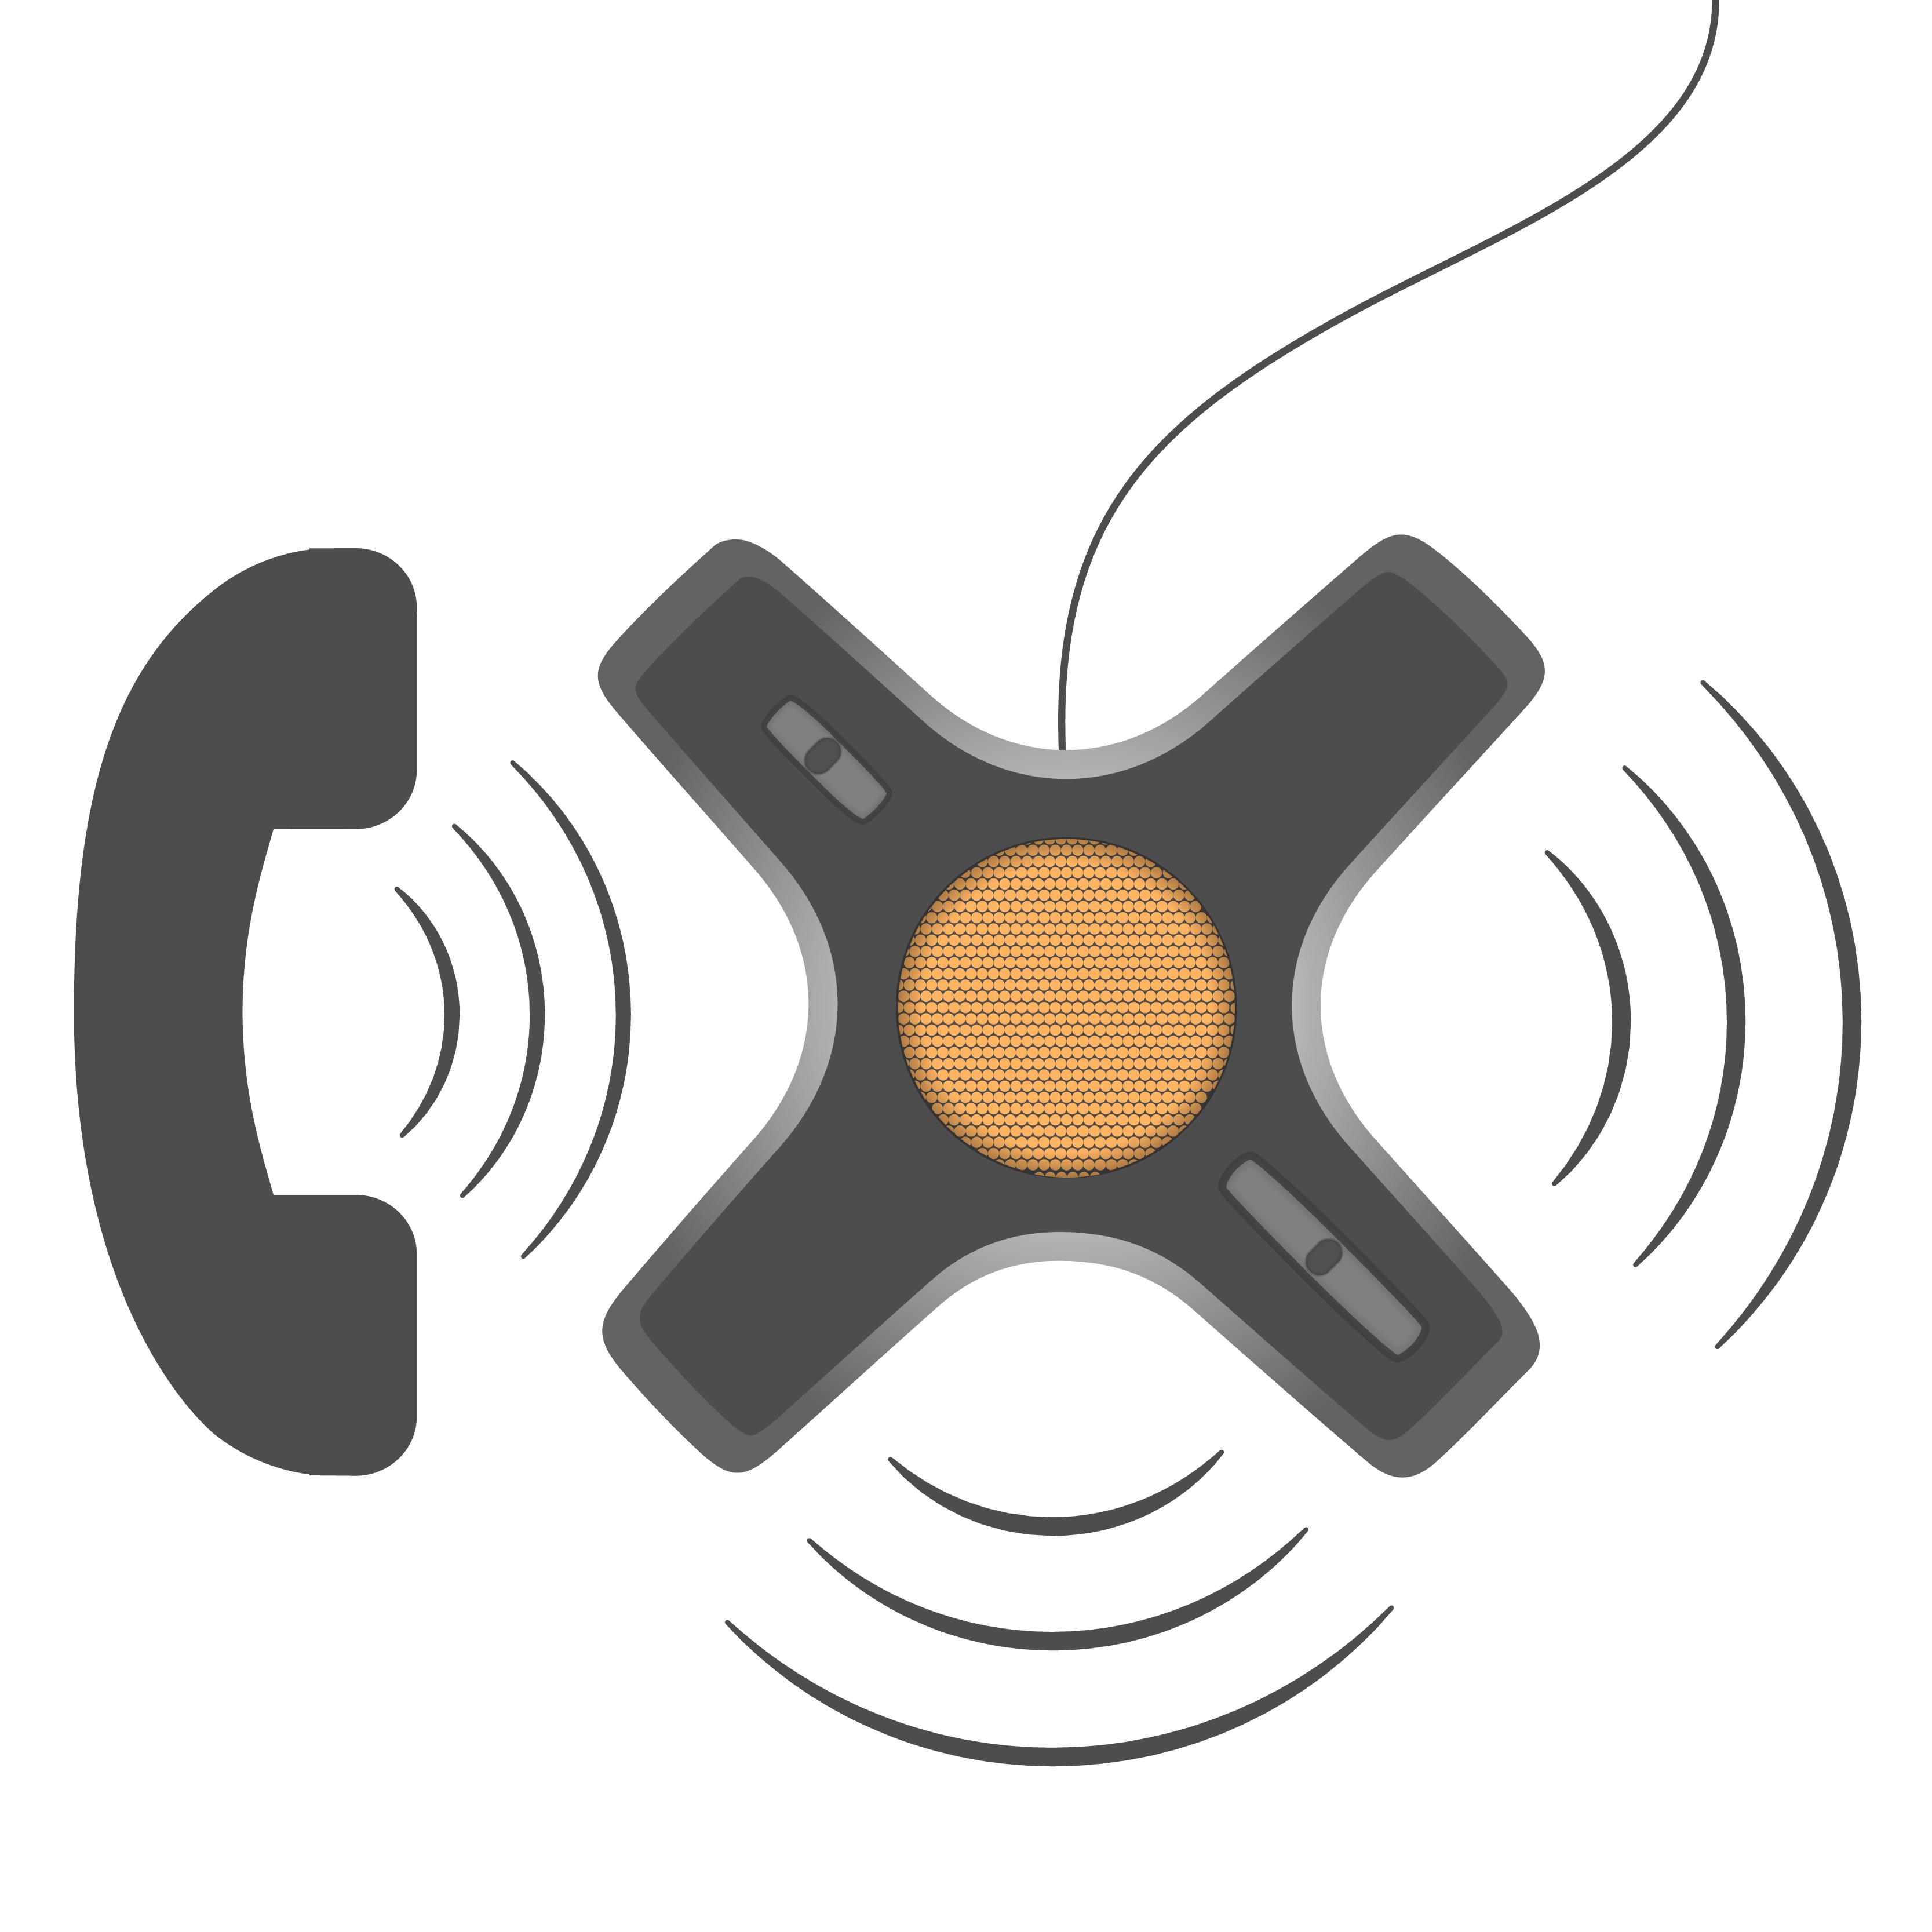 HSW_ICON_Audiokonf_analog_grau